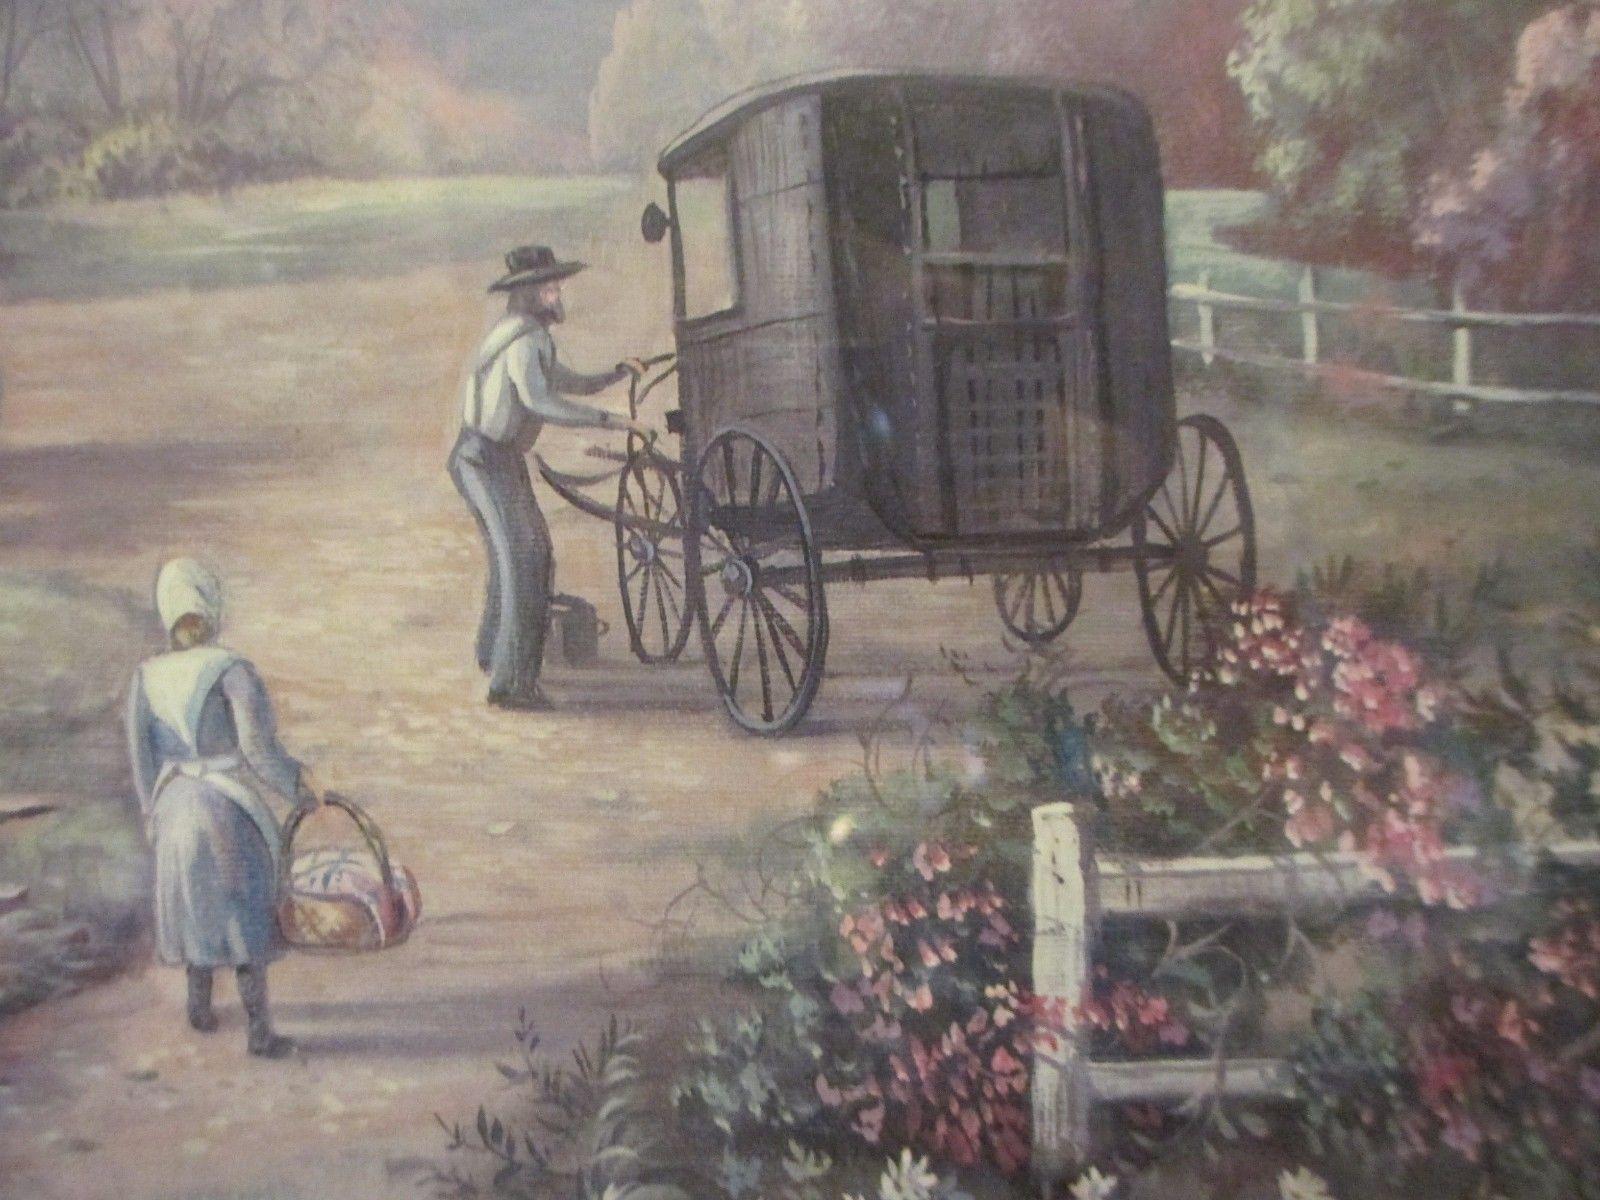 Vintage 26 Carl Valente Home Interiors Amish Life Framed